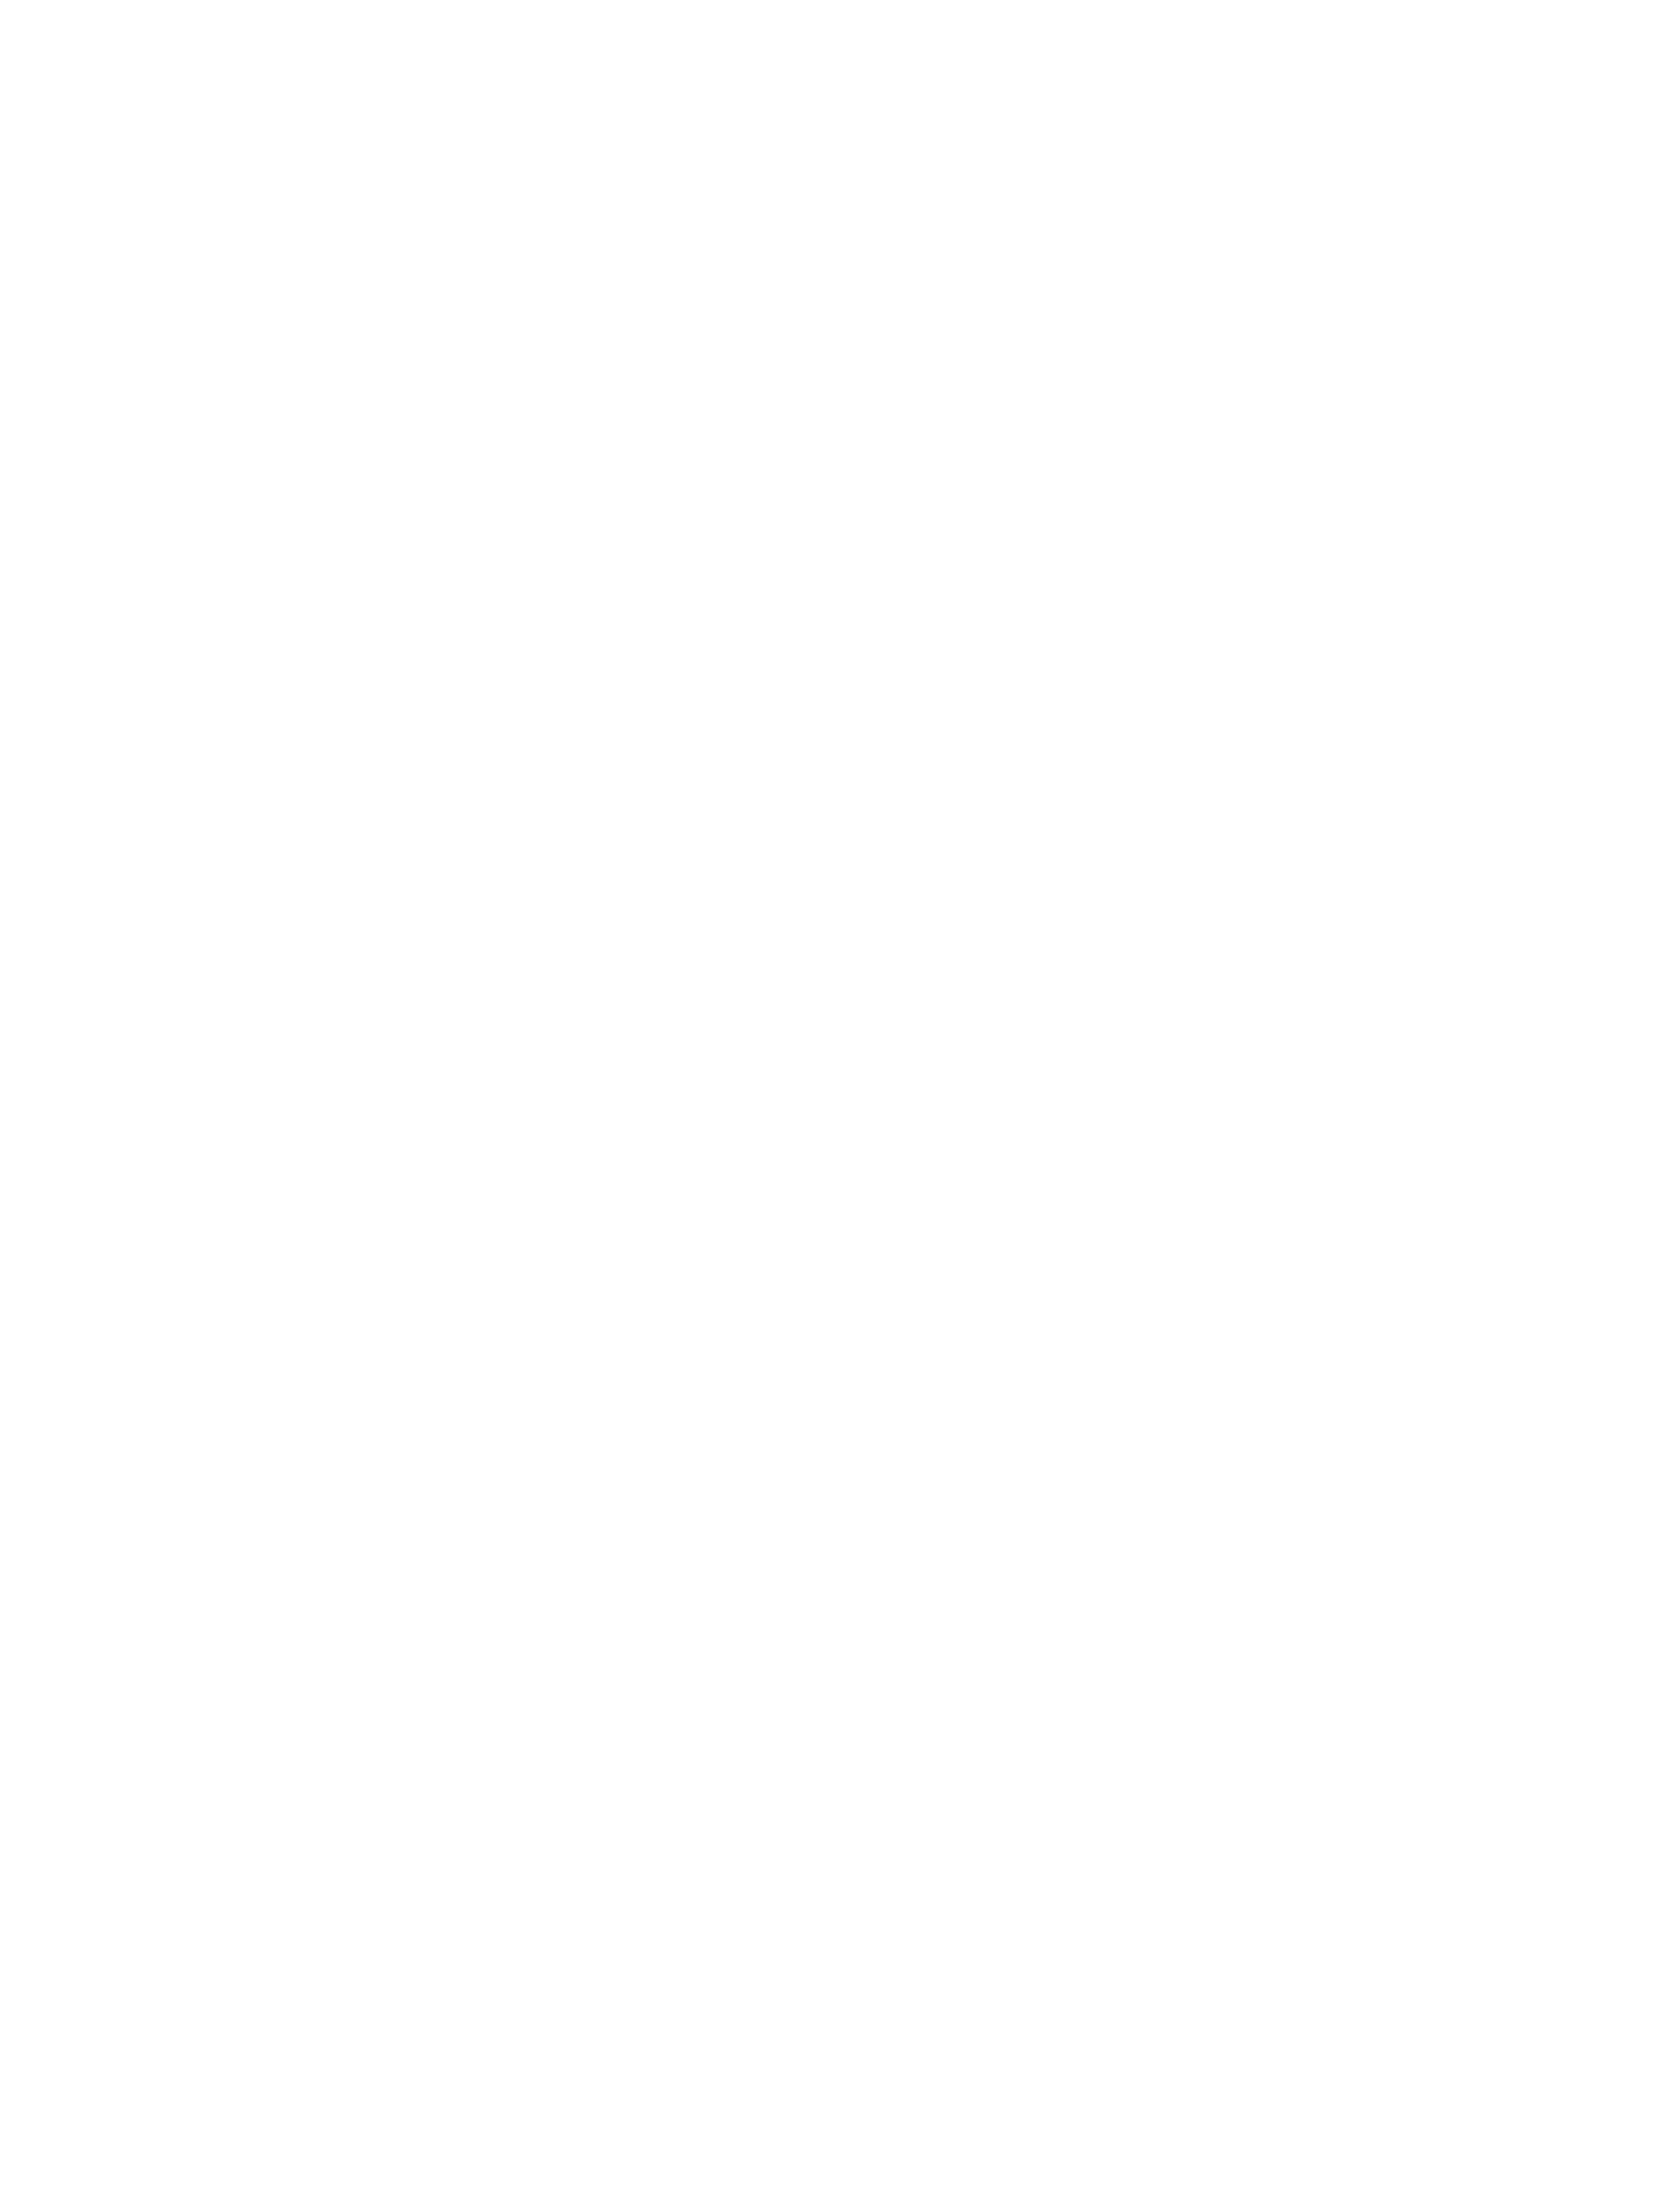 Arrow-Illustration(12)